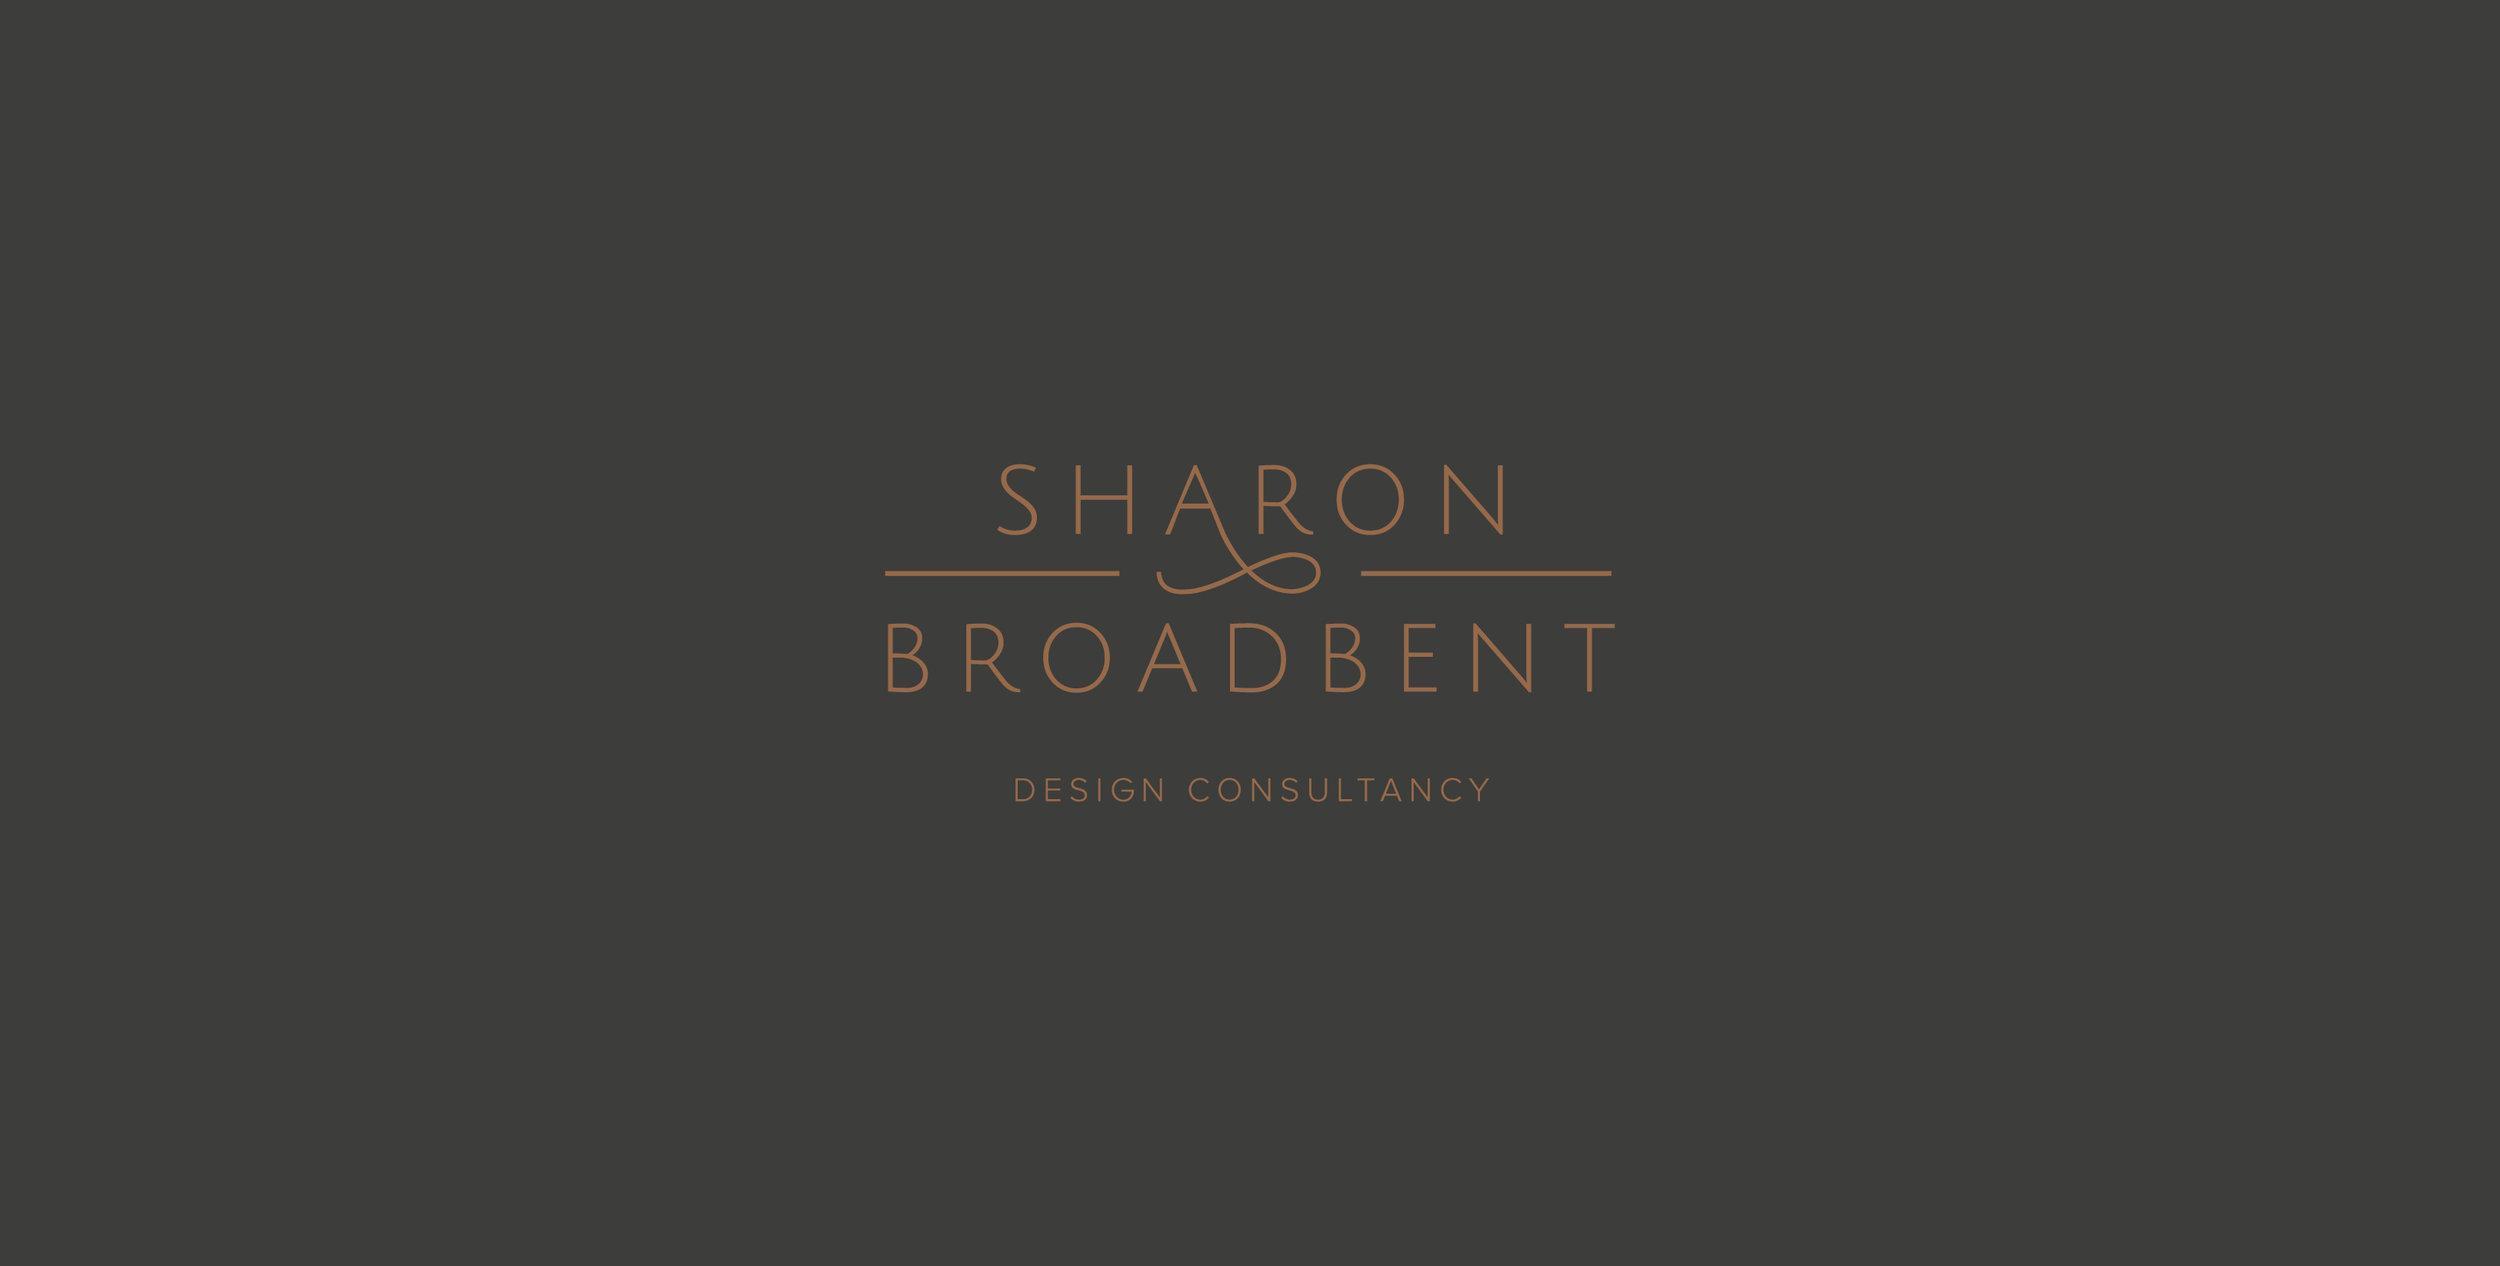 The Apple Yard Sharon Broadbent